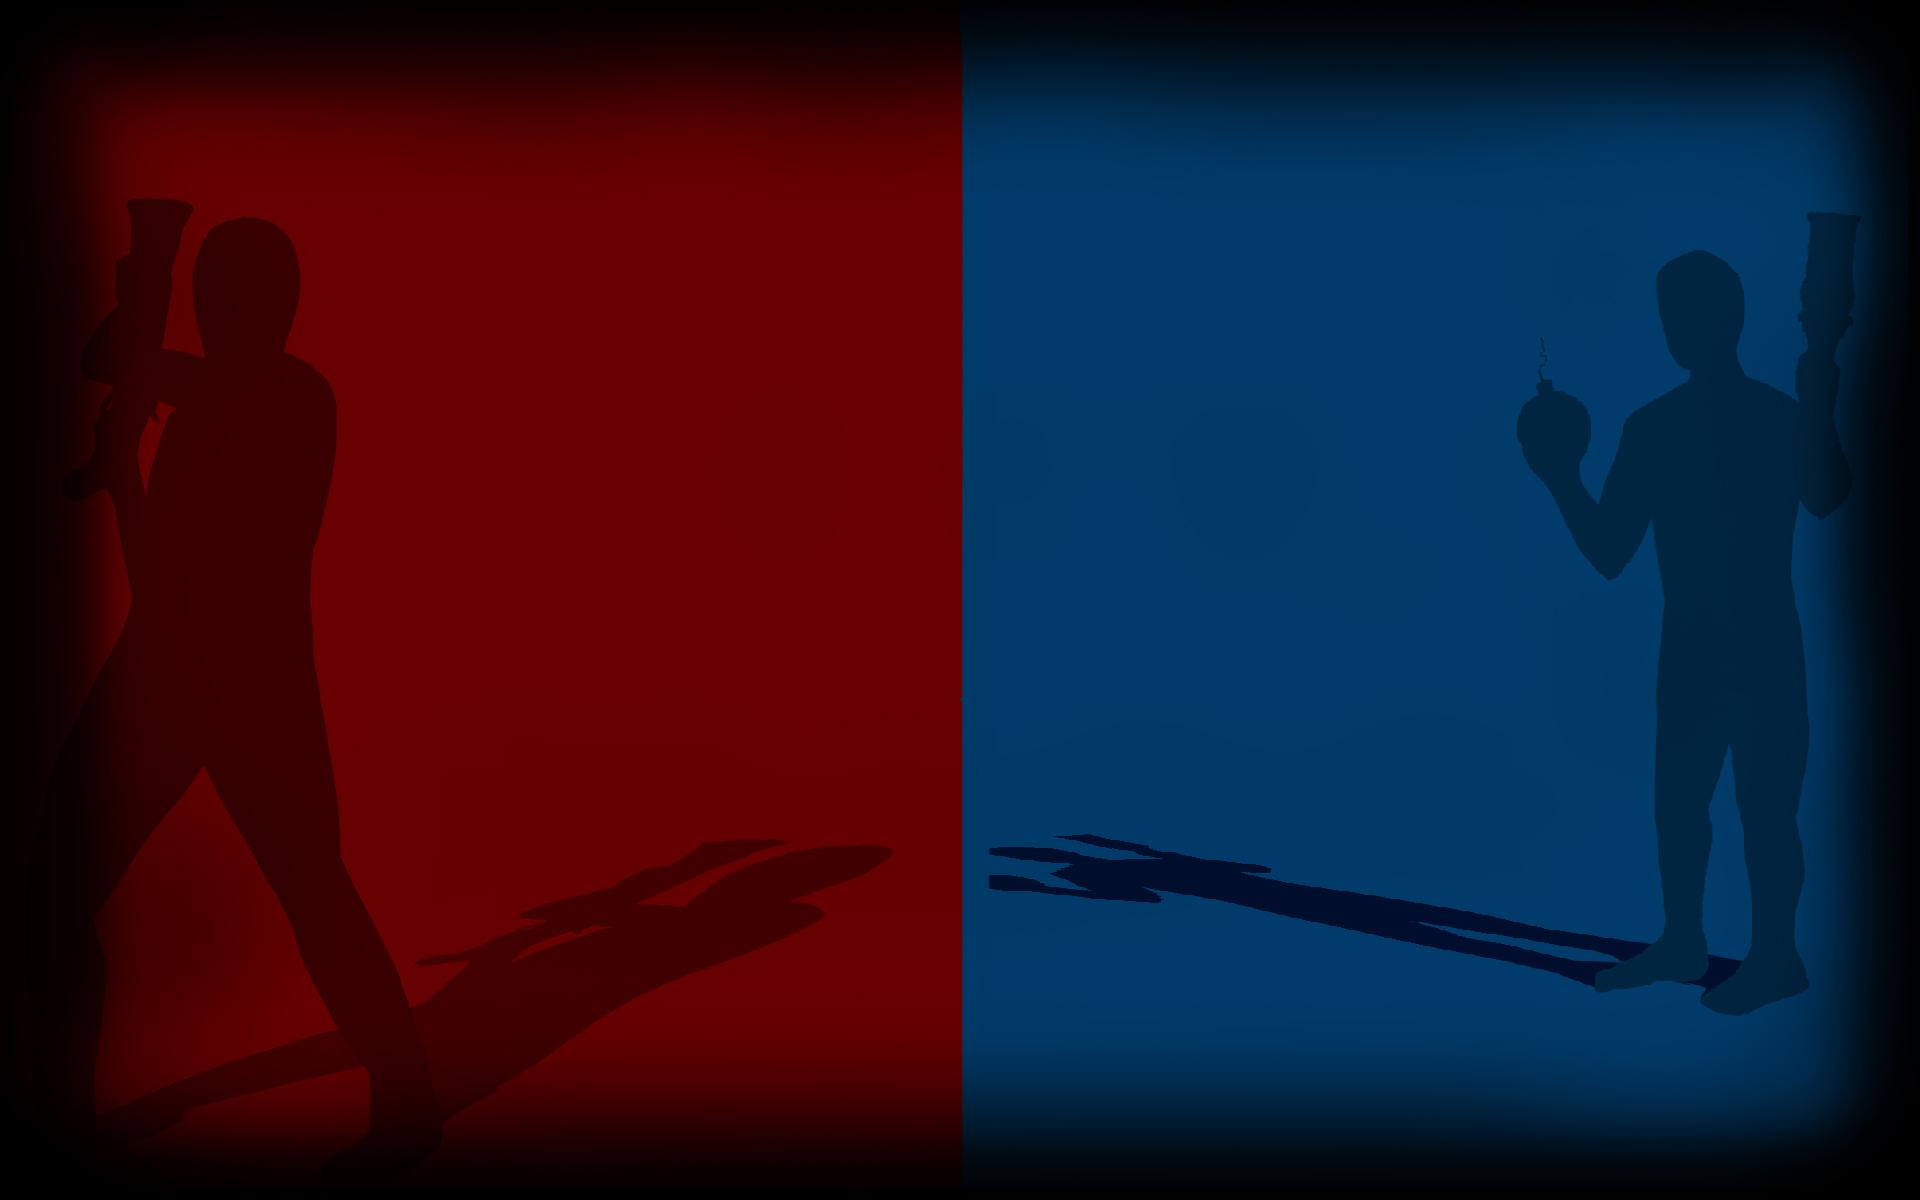 Red Vs Blue (Profile Background)